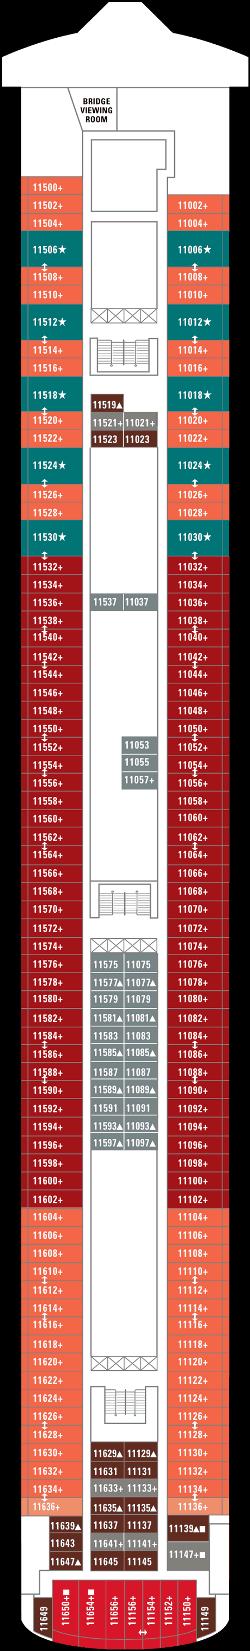 Norwegian Gem Deck 11: Deck 11